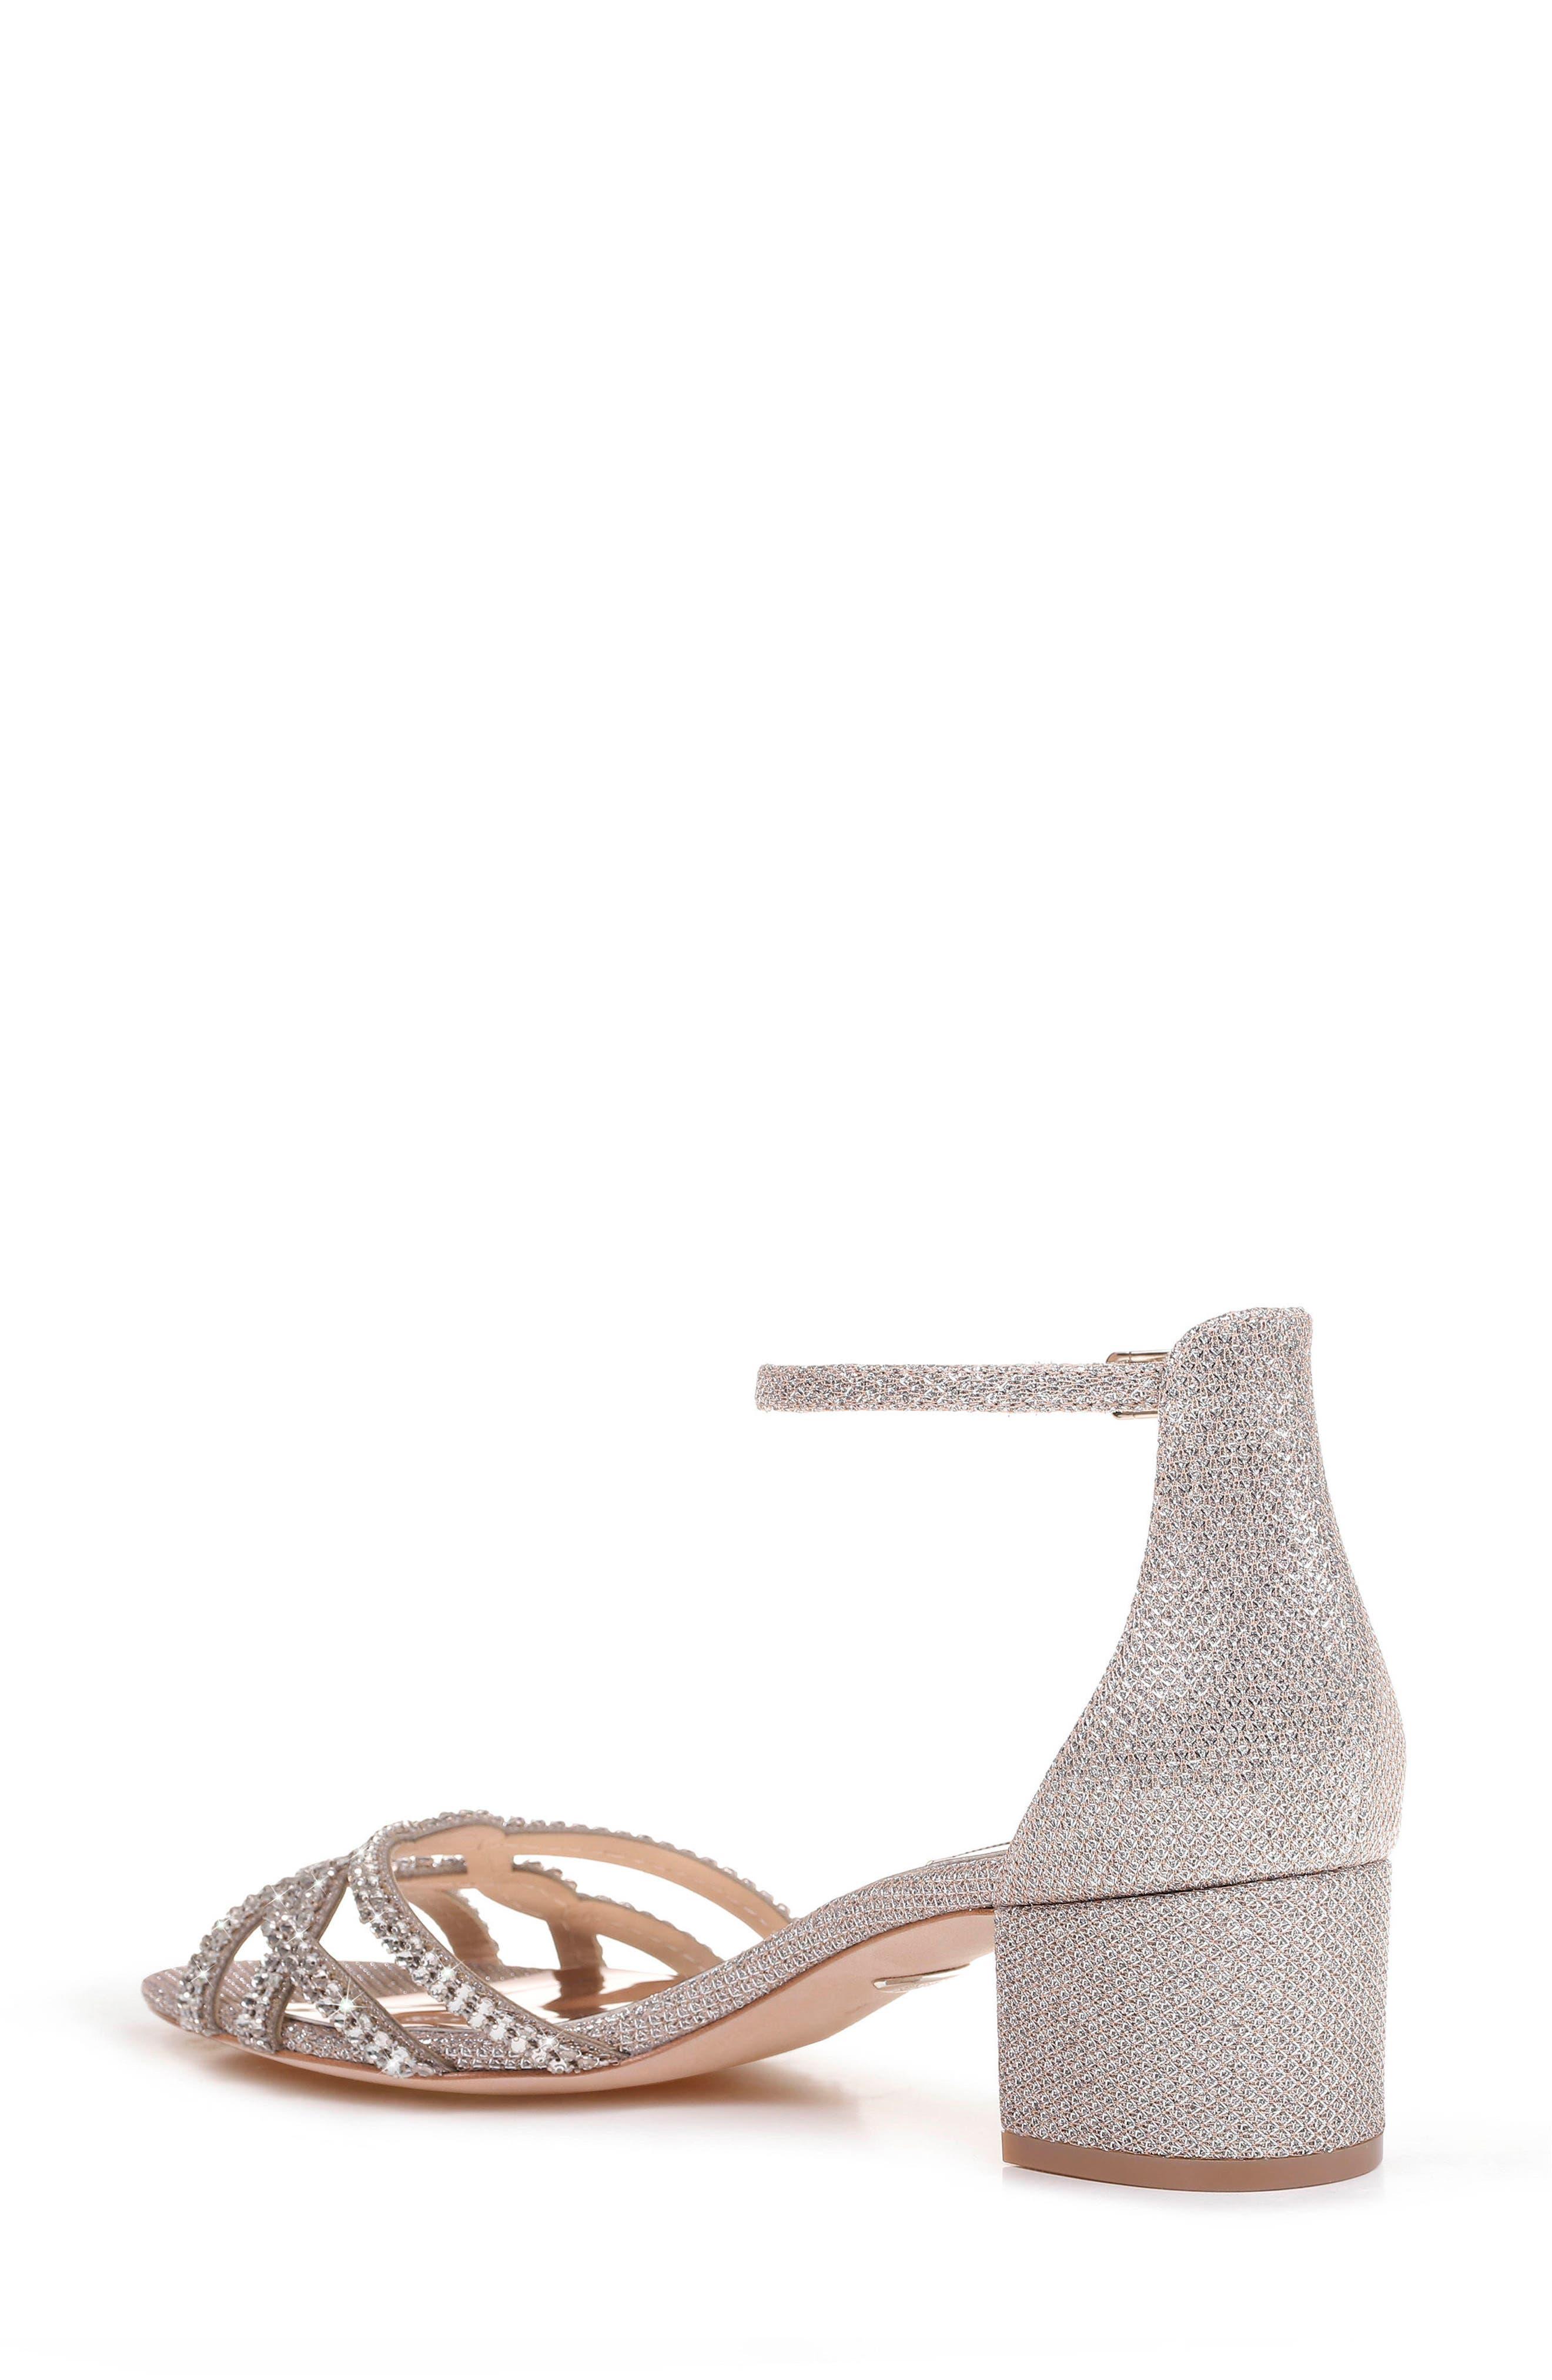 Alternate Image 2  - Badgley Mischka Sonya Block Heel Sandal (Women)